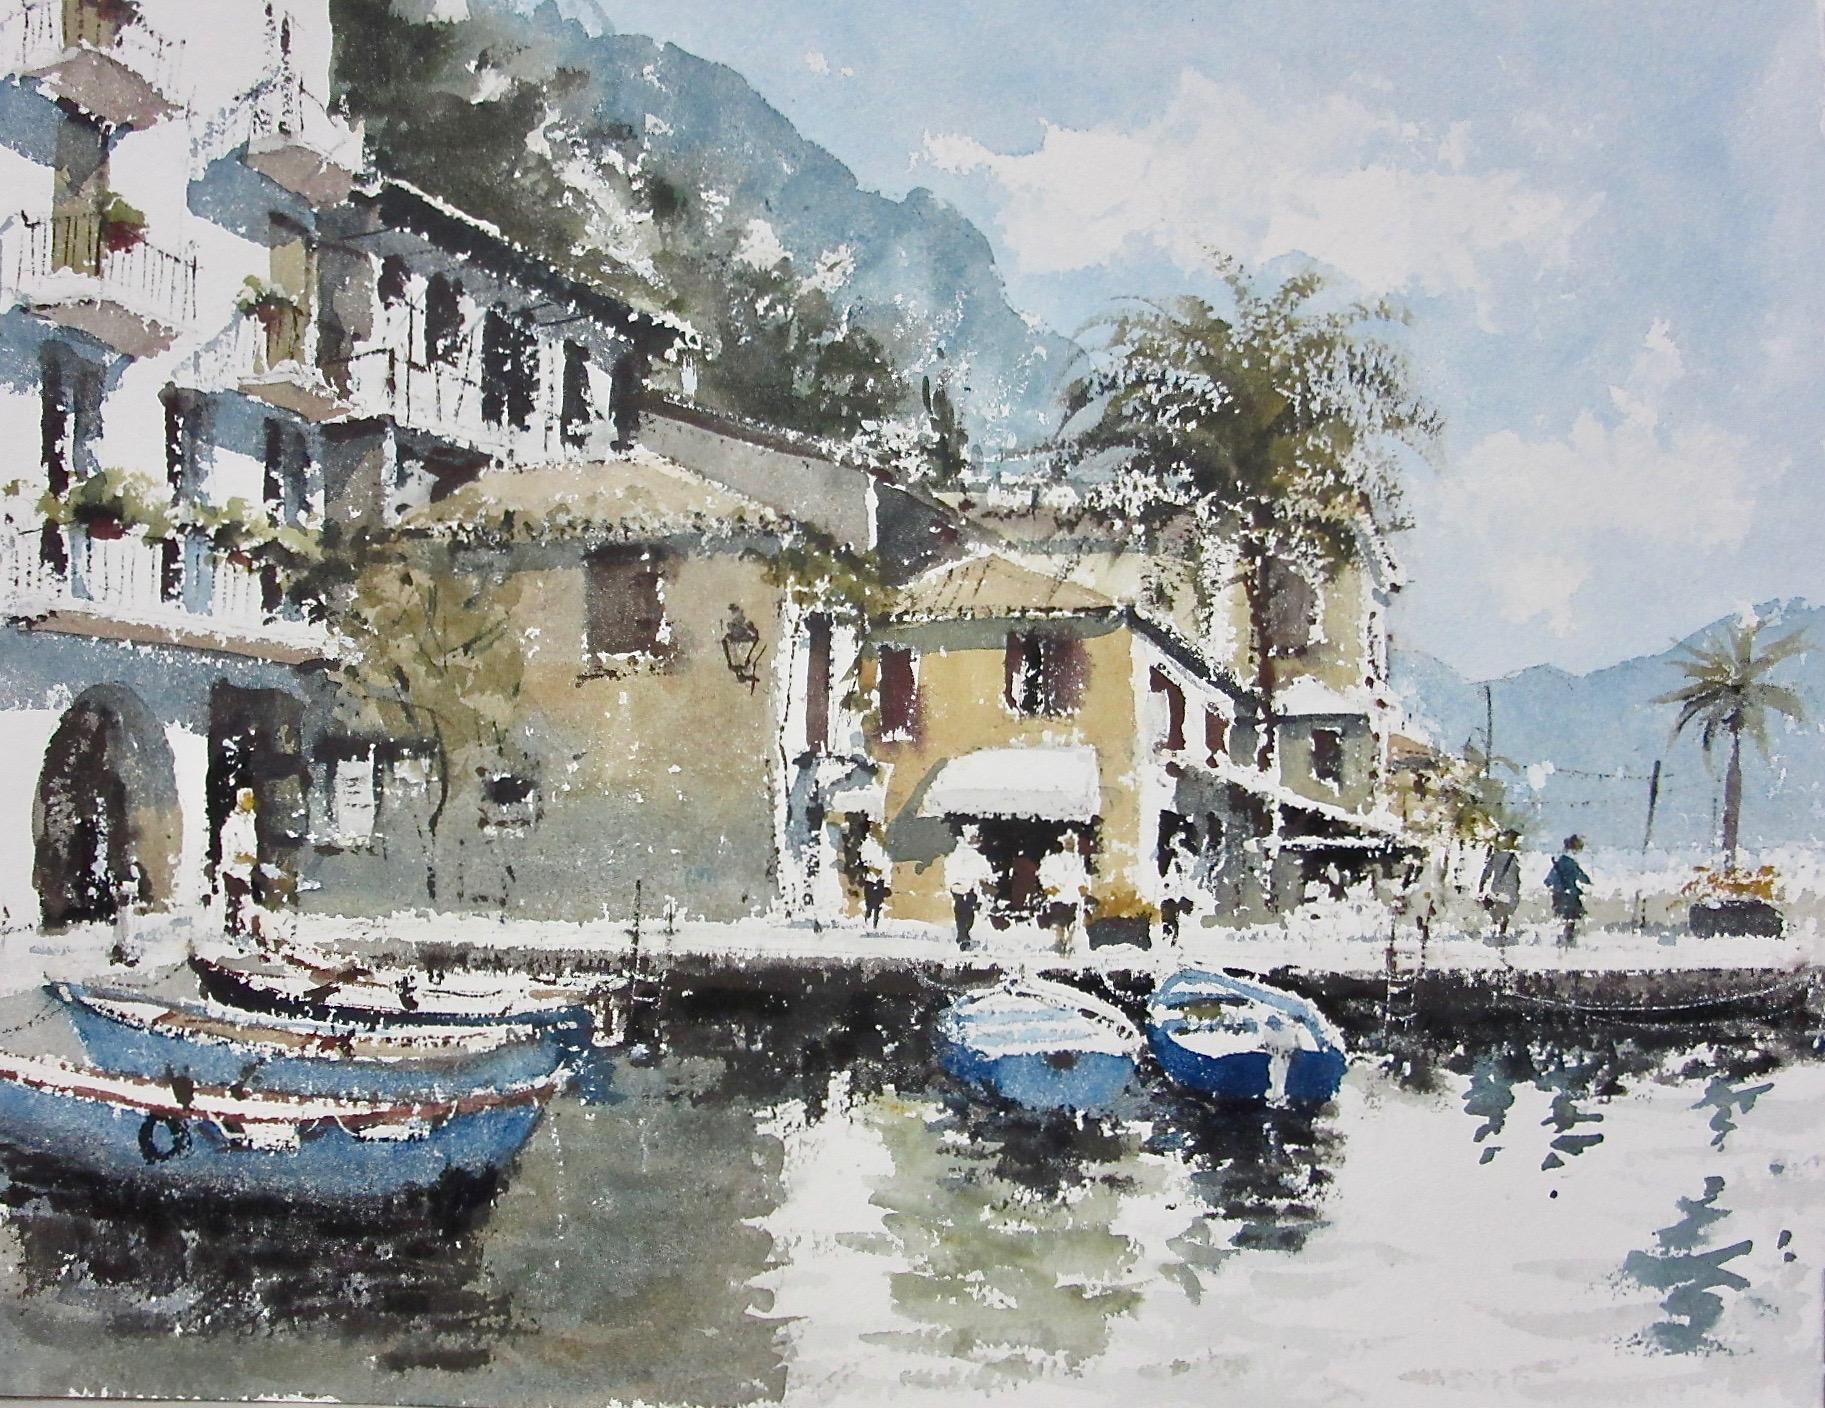 Limone Lake Garda Italy: 11 x 15.5 in: £750